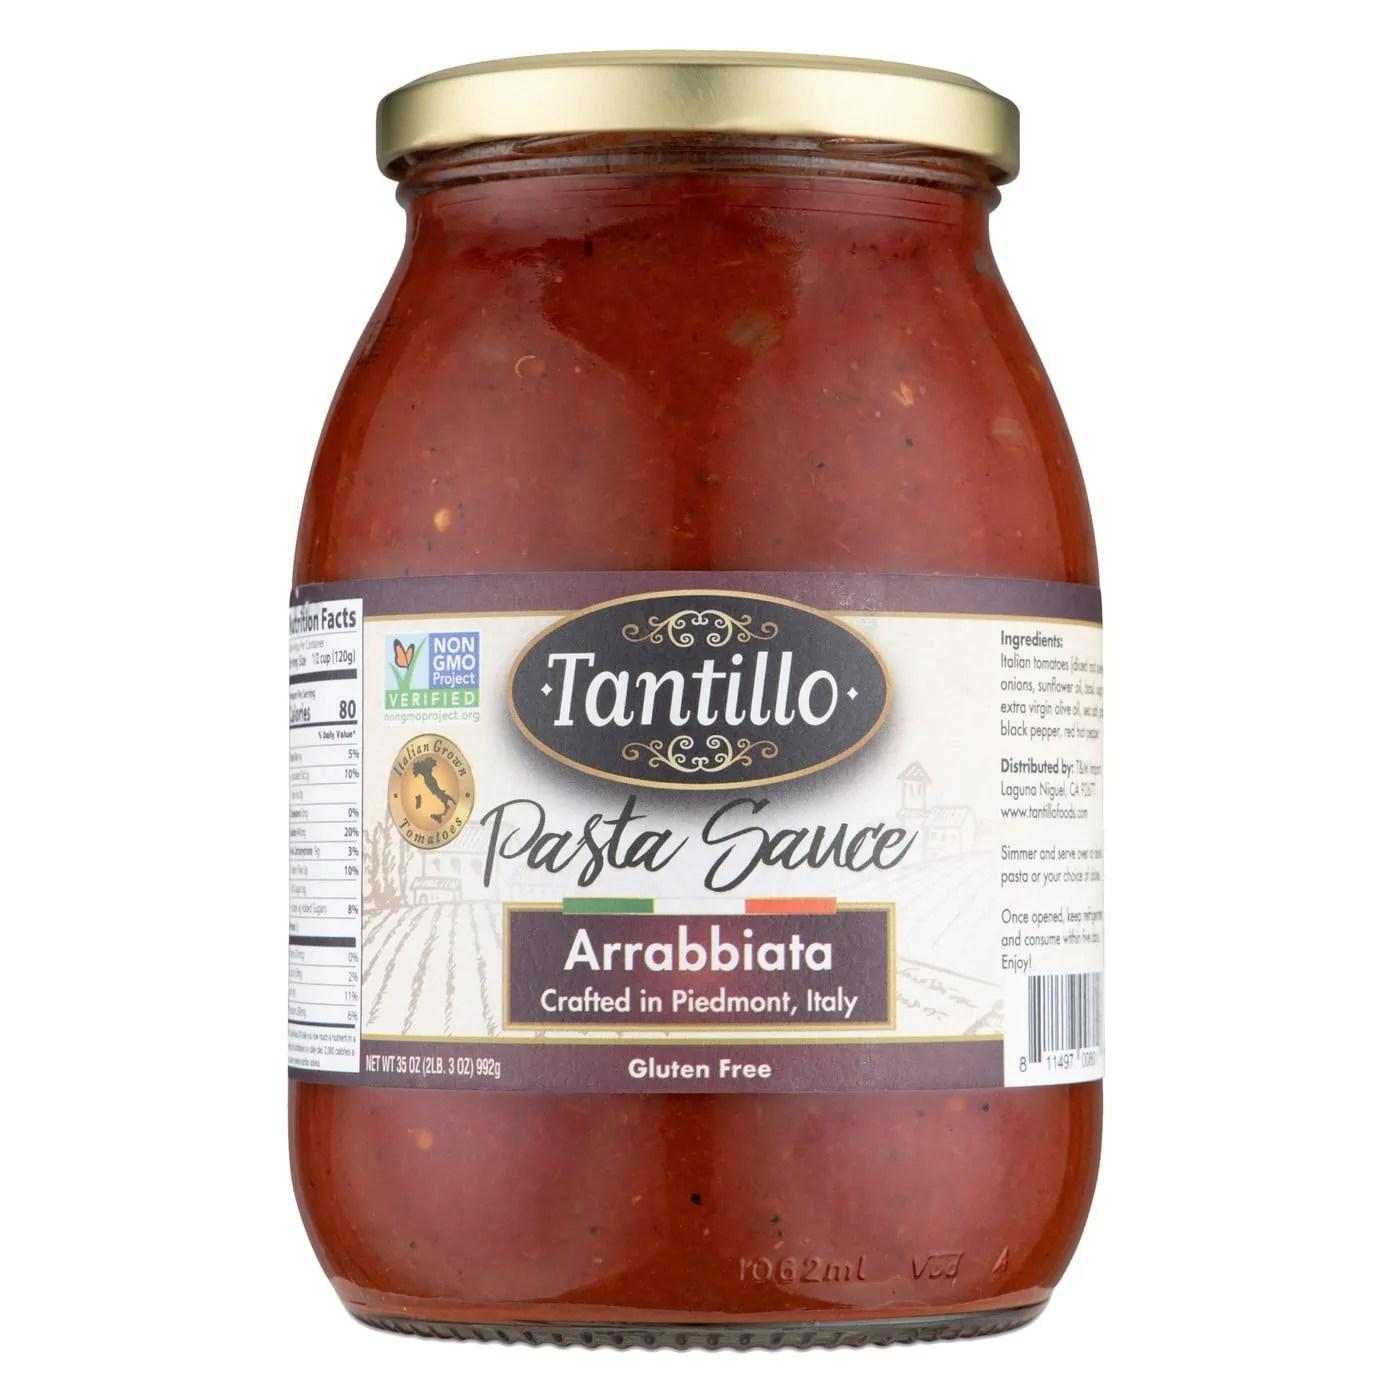 Tantillo Imported Italian Arrabbiata Pasta Sauce 35oz (Pack of 2)